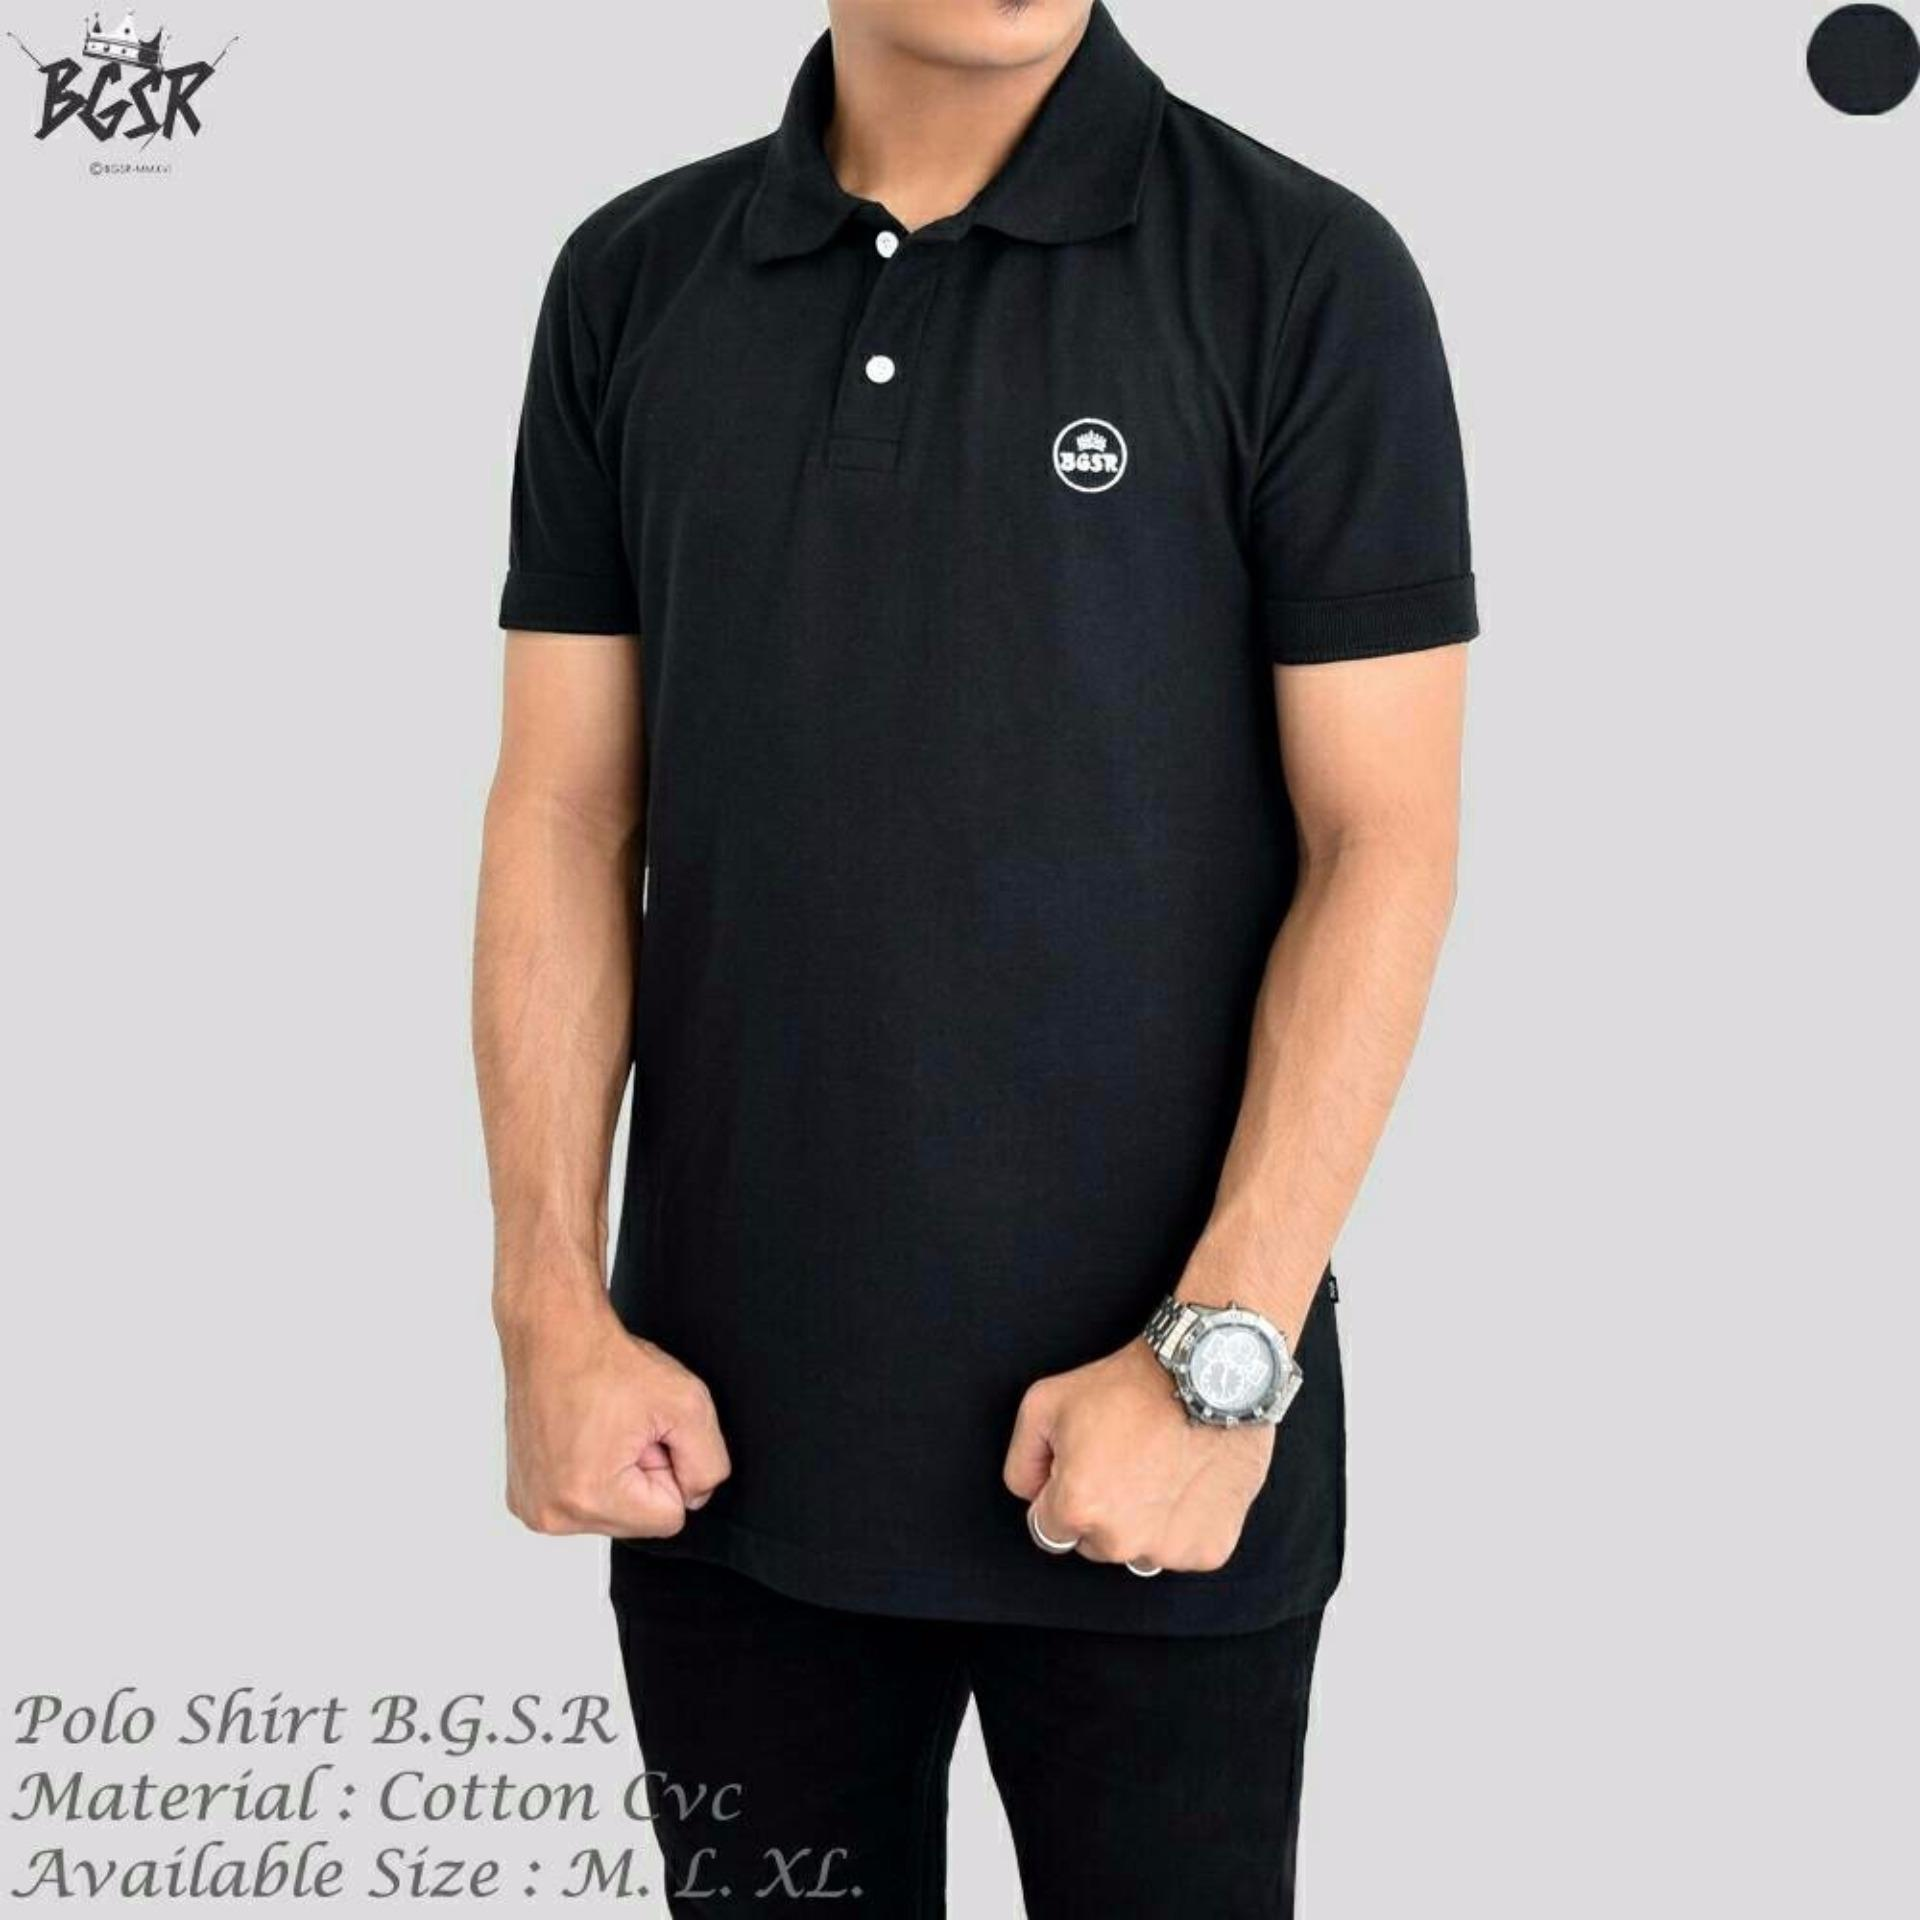 Sz Graphicspolo Shirtt Shirt Polo Pria Kaos T  Seragam Berkerah Grosir Baju Berkerahkaos Polospolo Polospolokaos Hitam